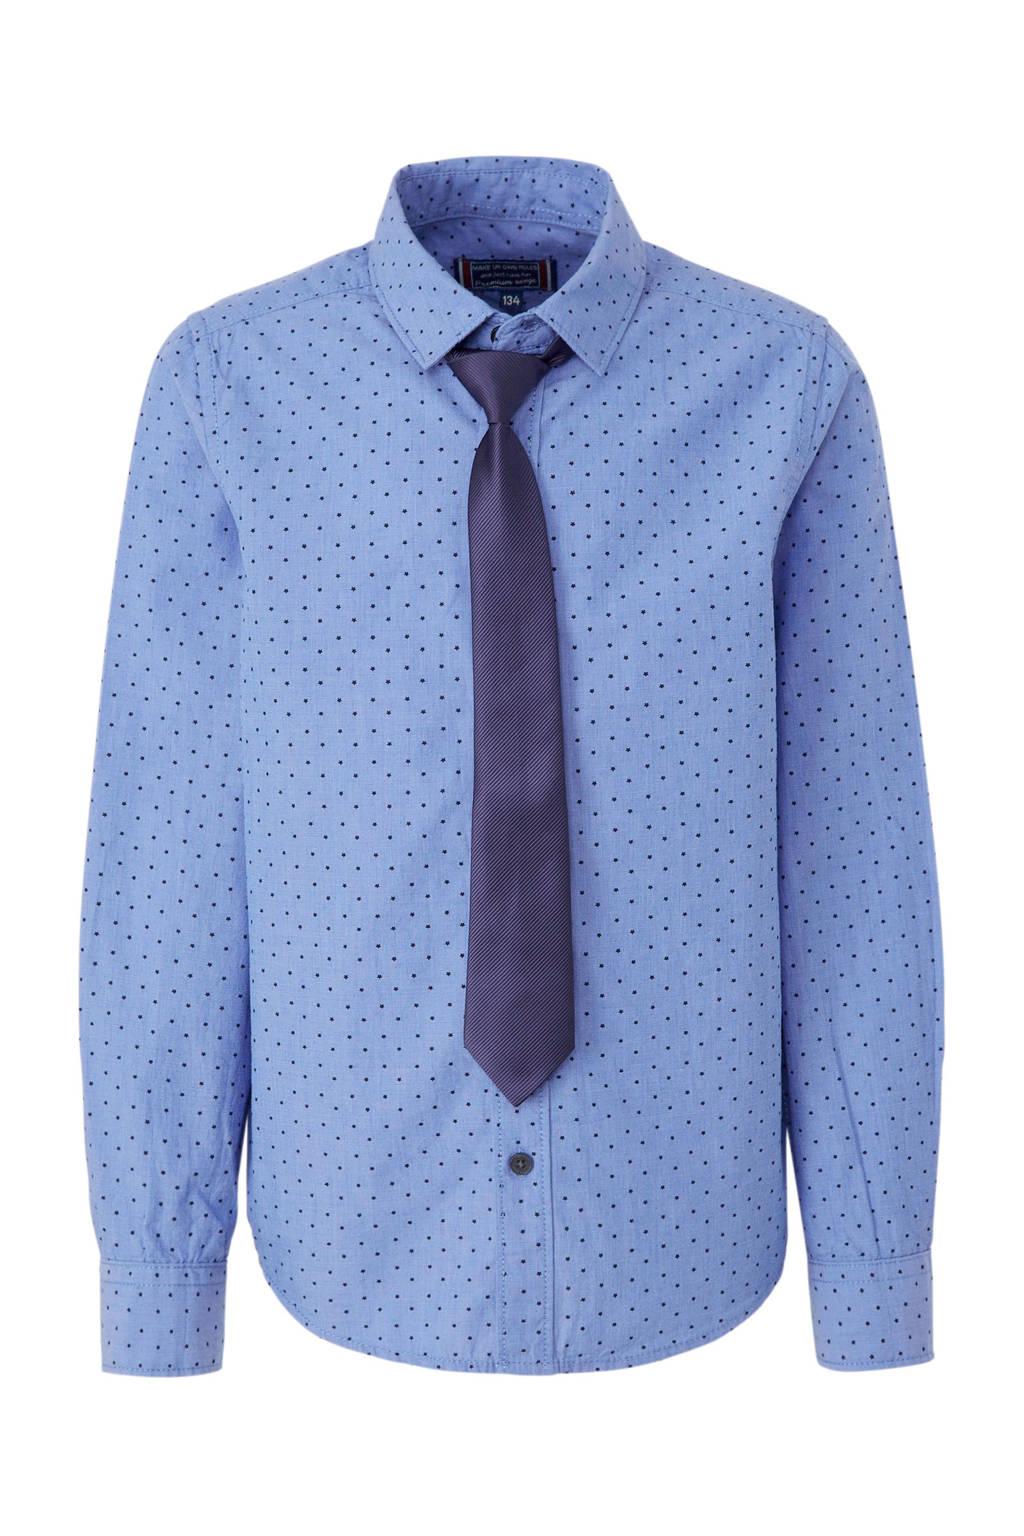 C&A Here & There overhemd met sterren + stropdas, Blauw